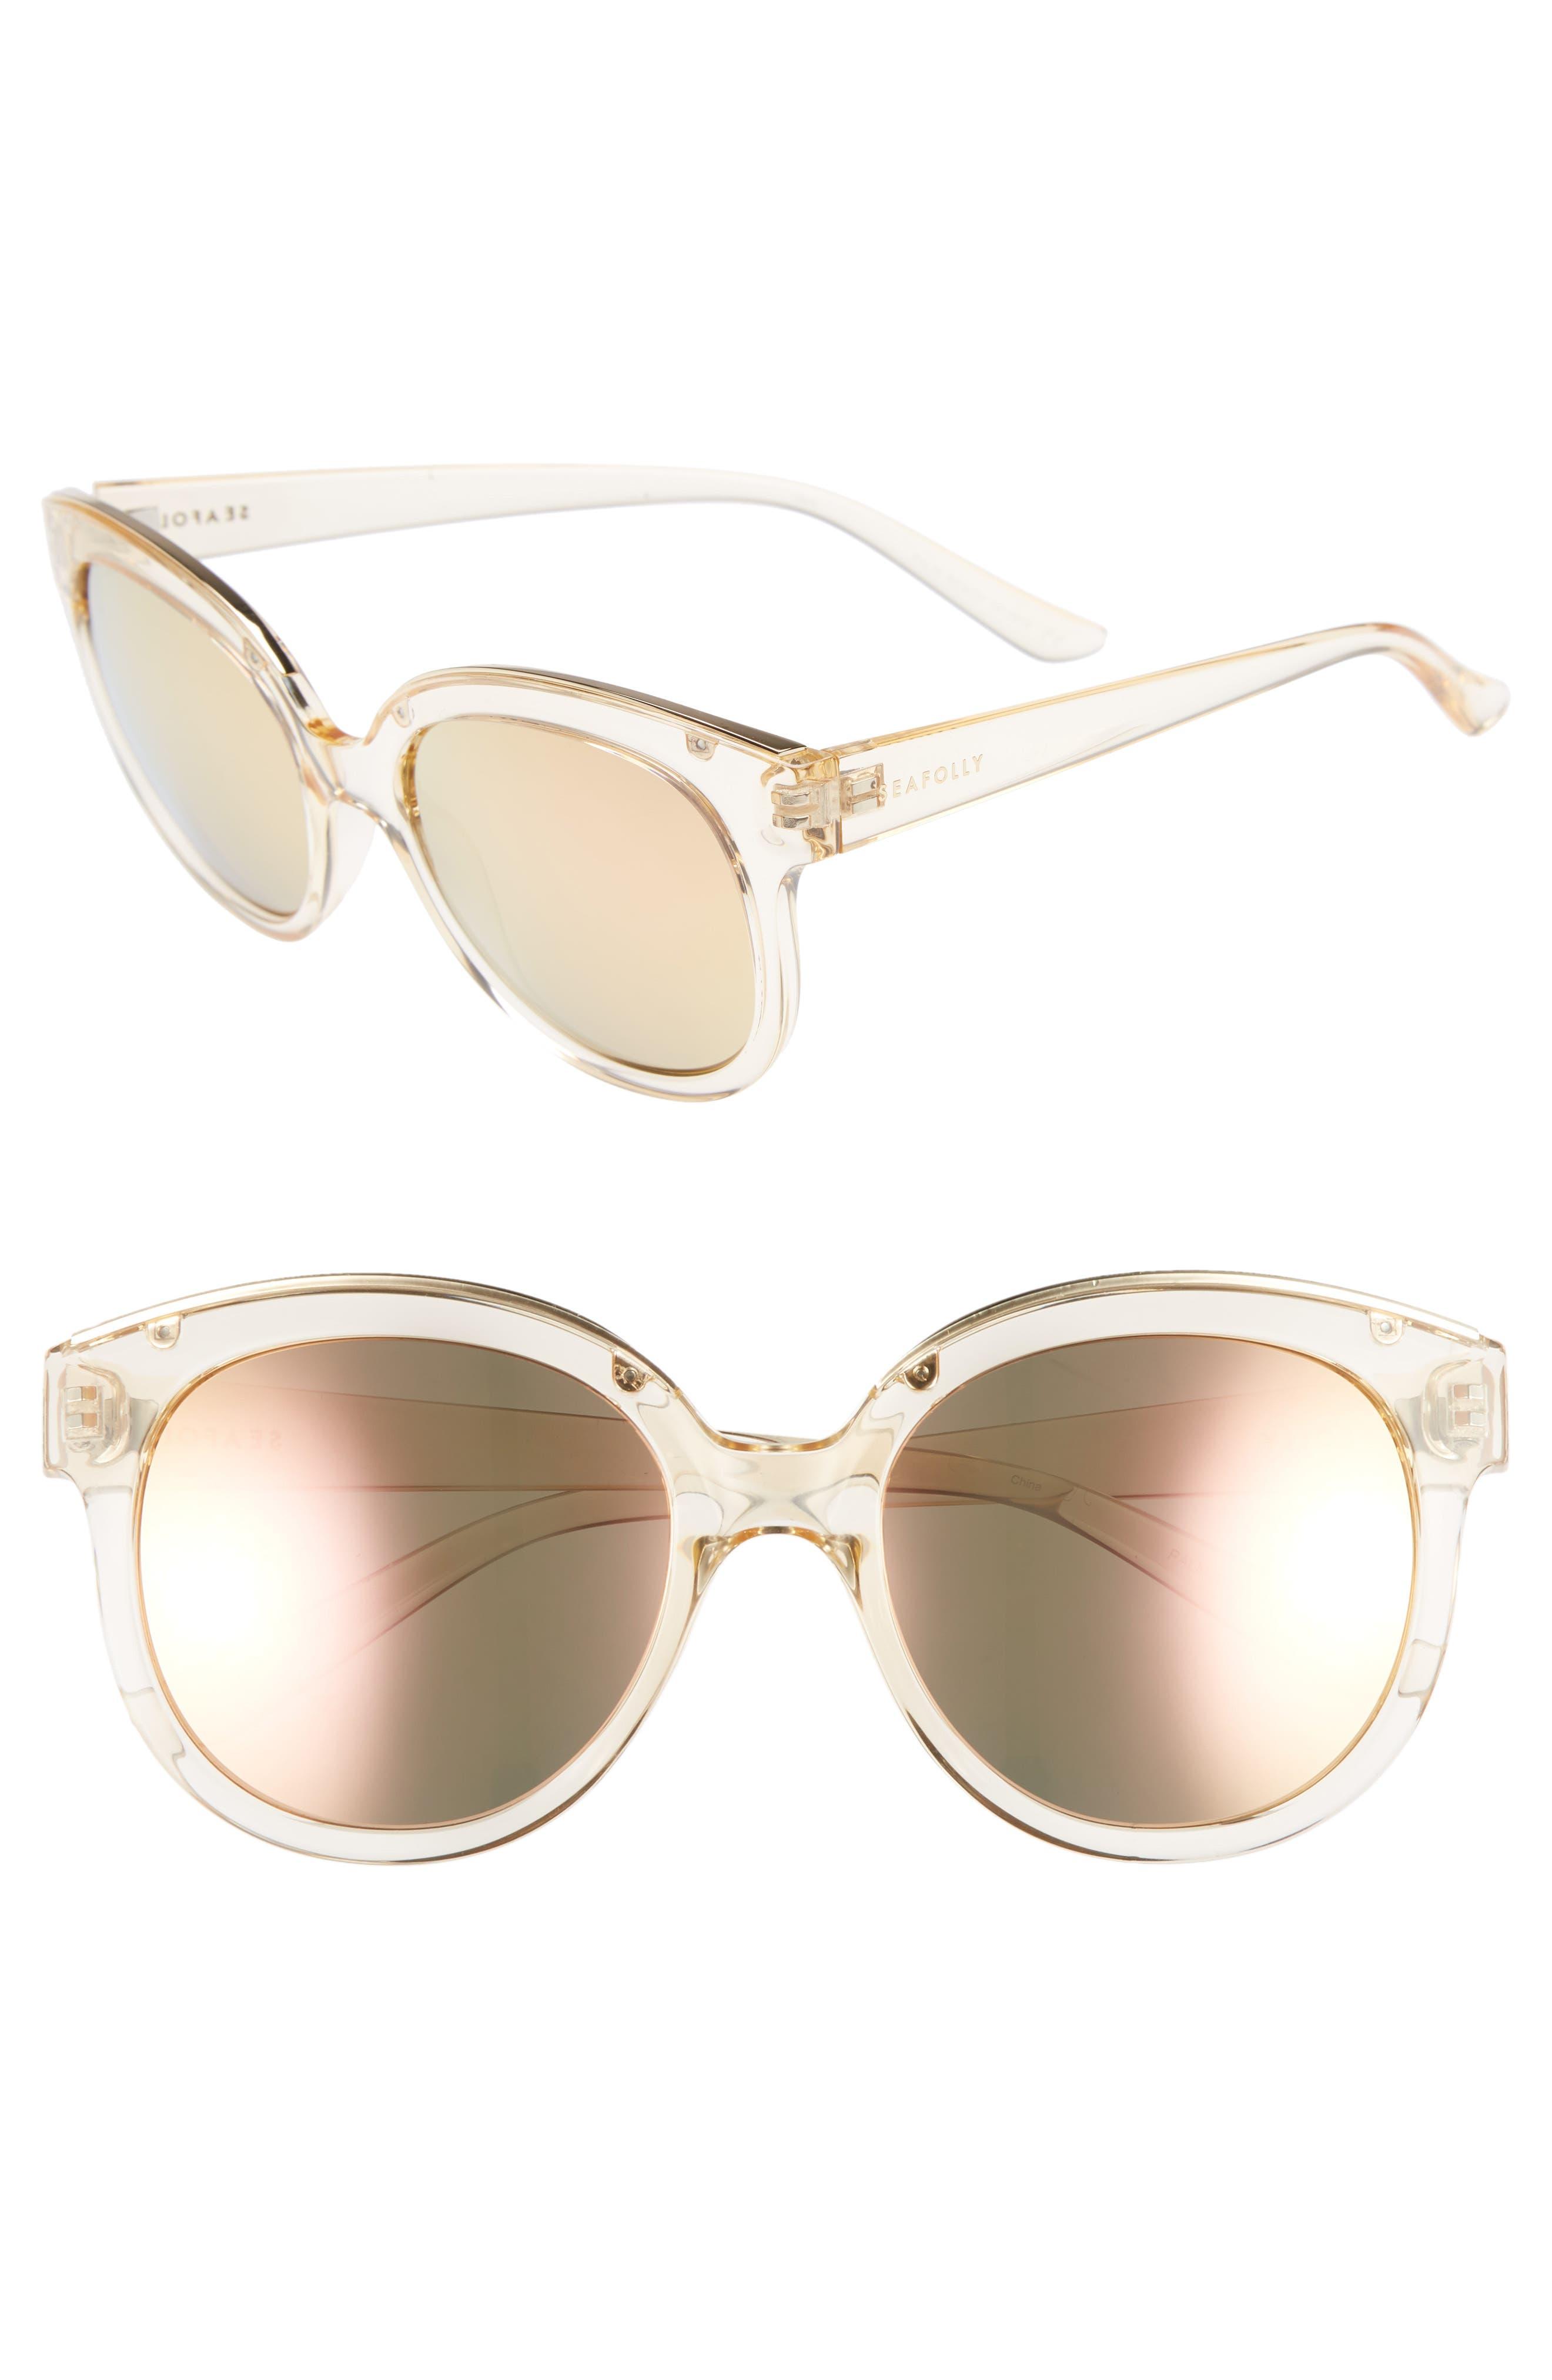 Palm Beach 54mm Cat Eye Sunglasses,                             Main thumbnail 1, color,                             Sand